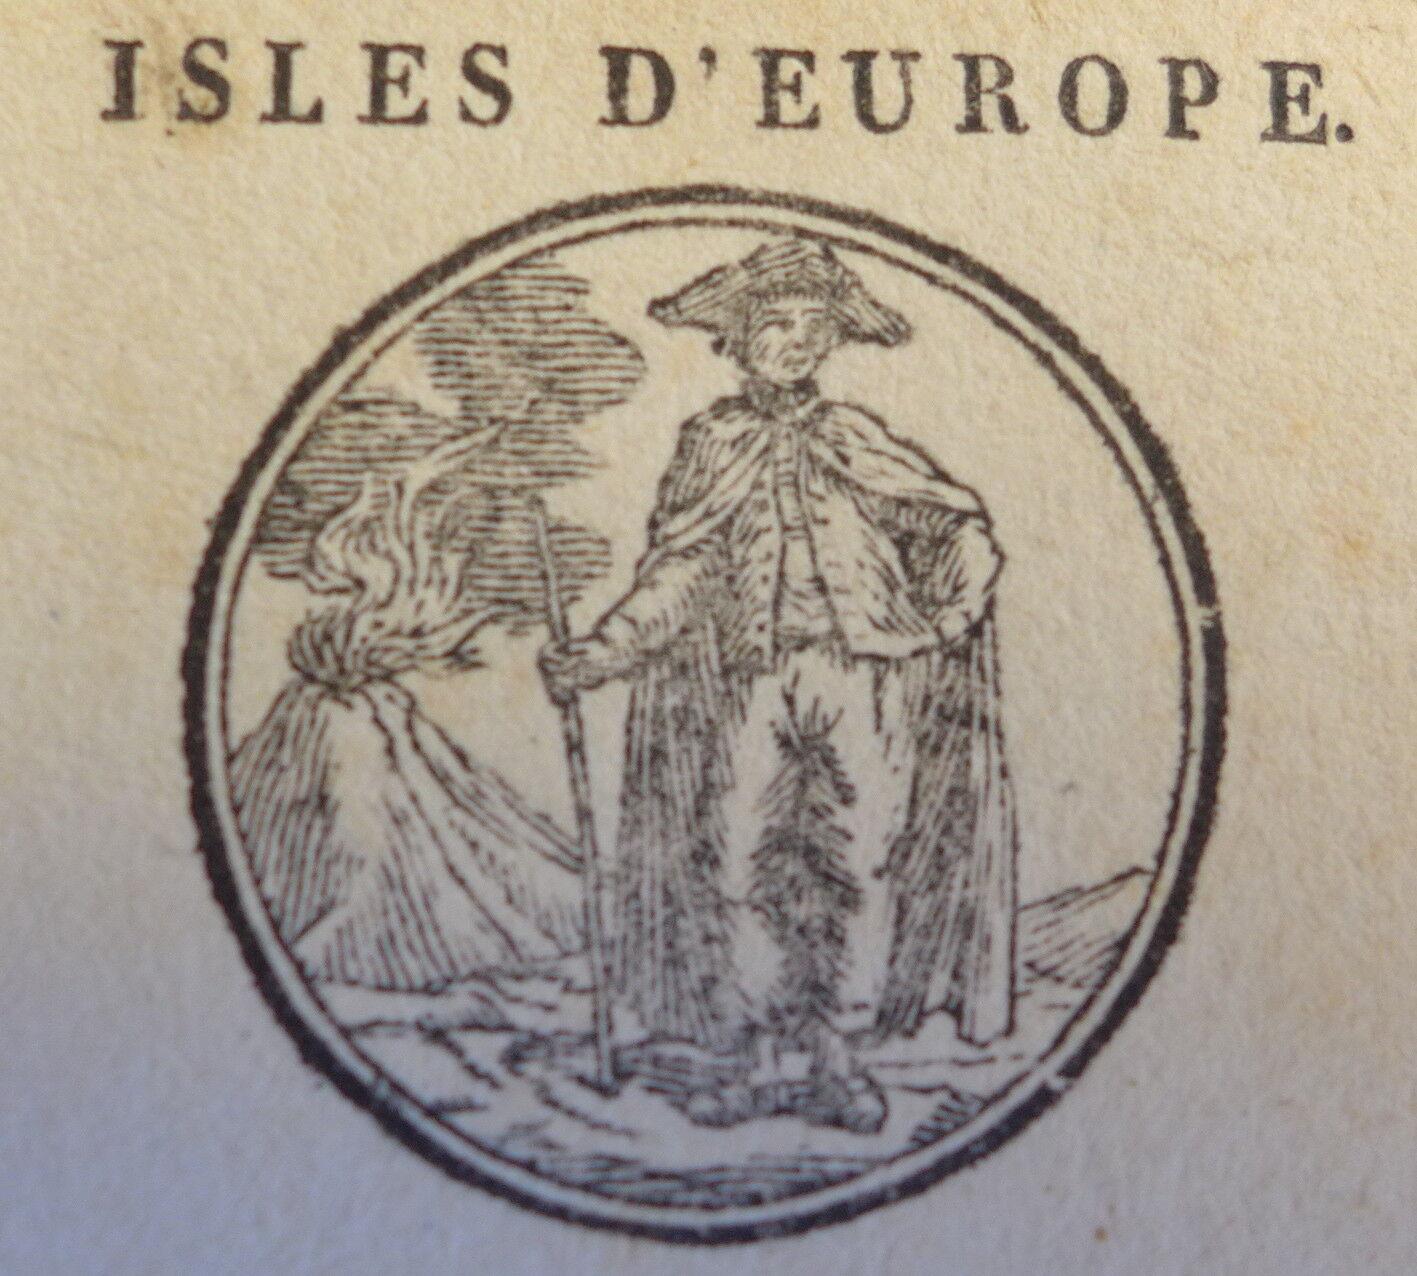 Geographie autote da gioco Playing autods Paris  1805 USA Italia Africa Asia  l'intera rete più bassa